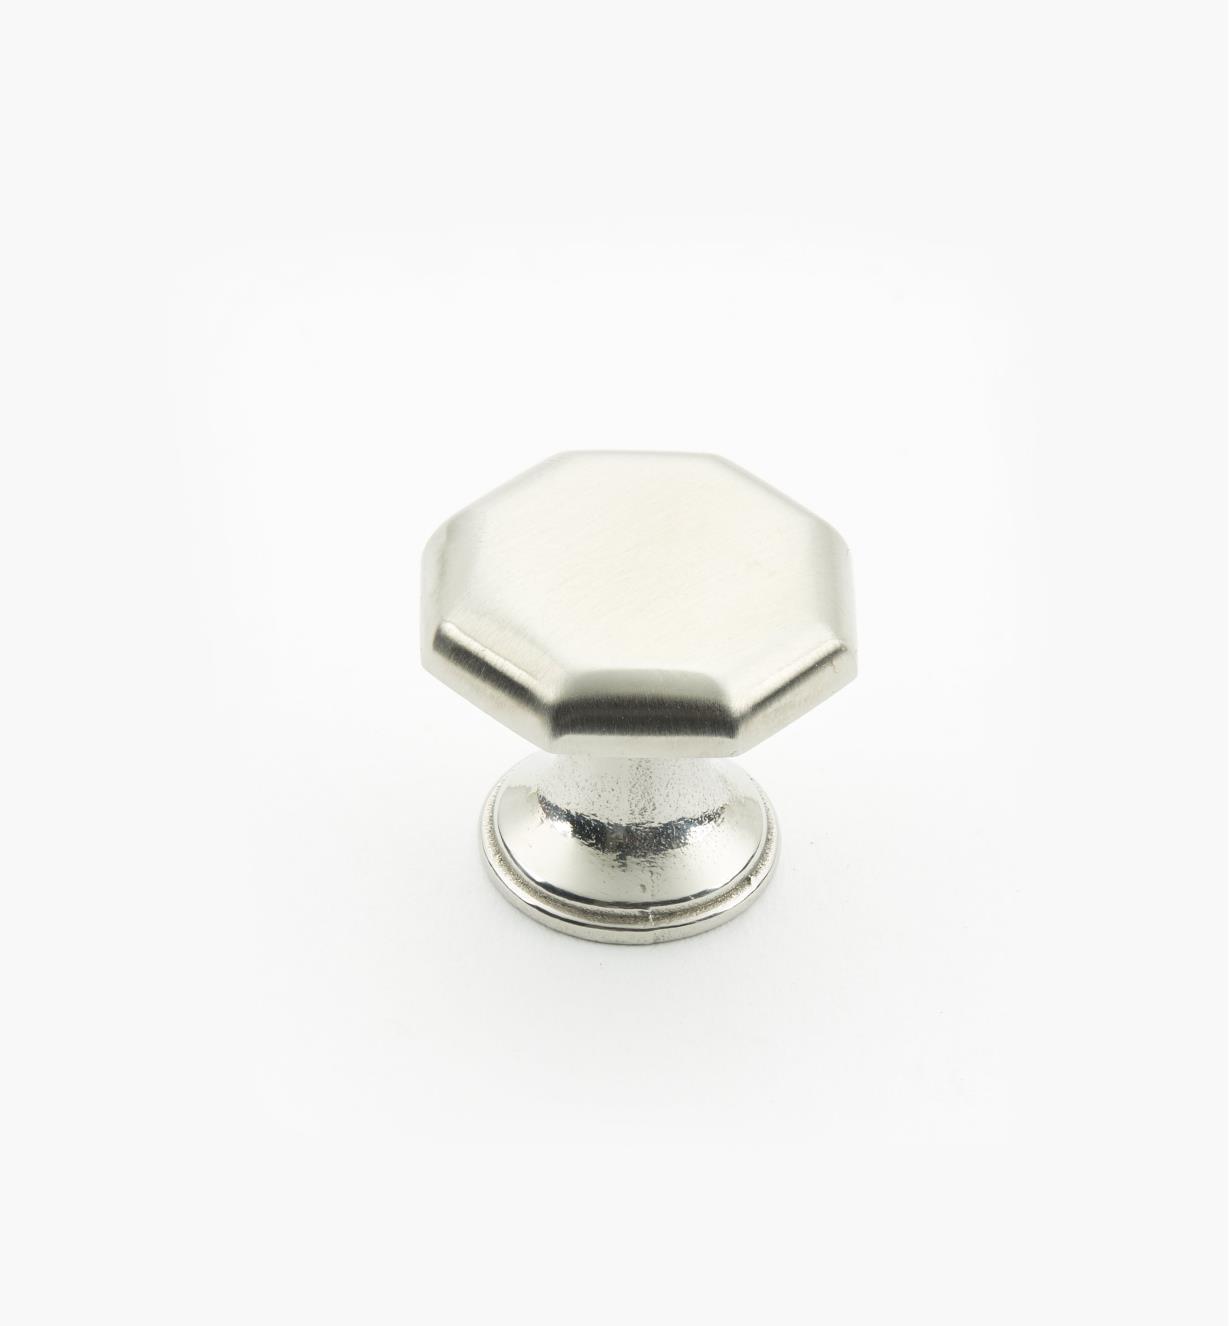 01W8291 - Bouton octogonal en acier inoxydable, 1pox7/8po